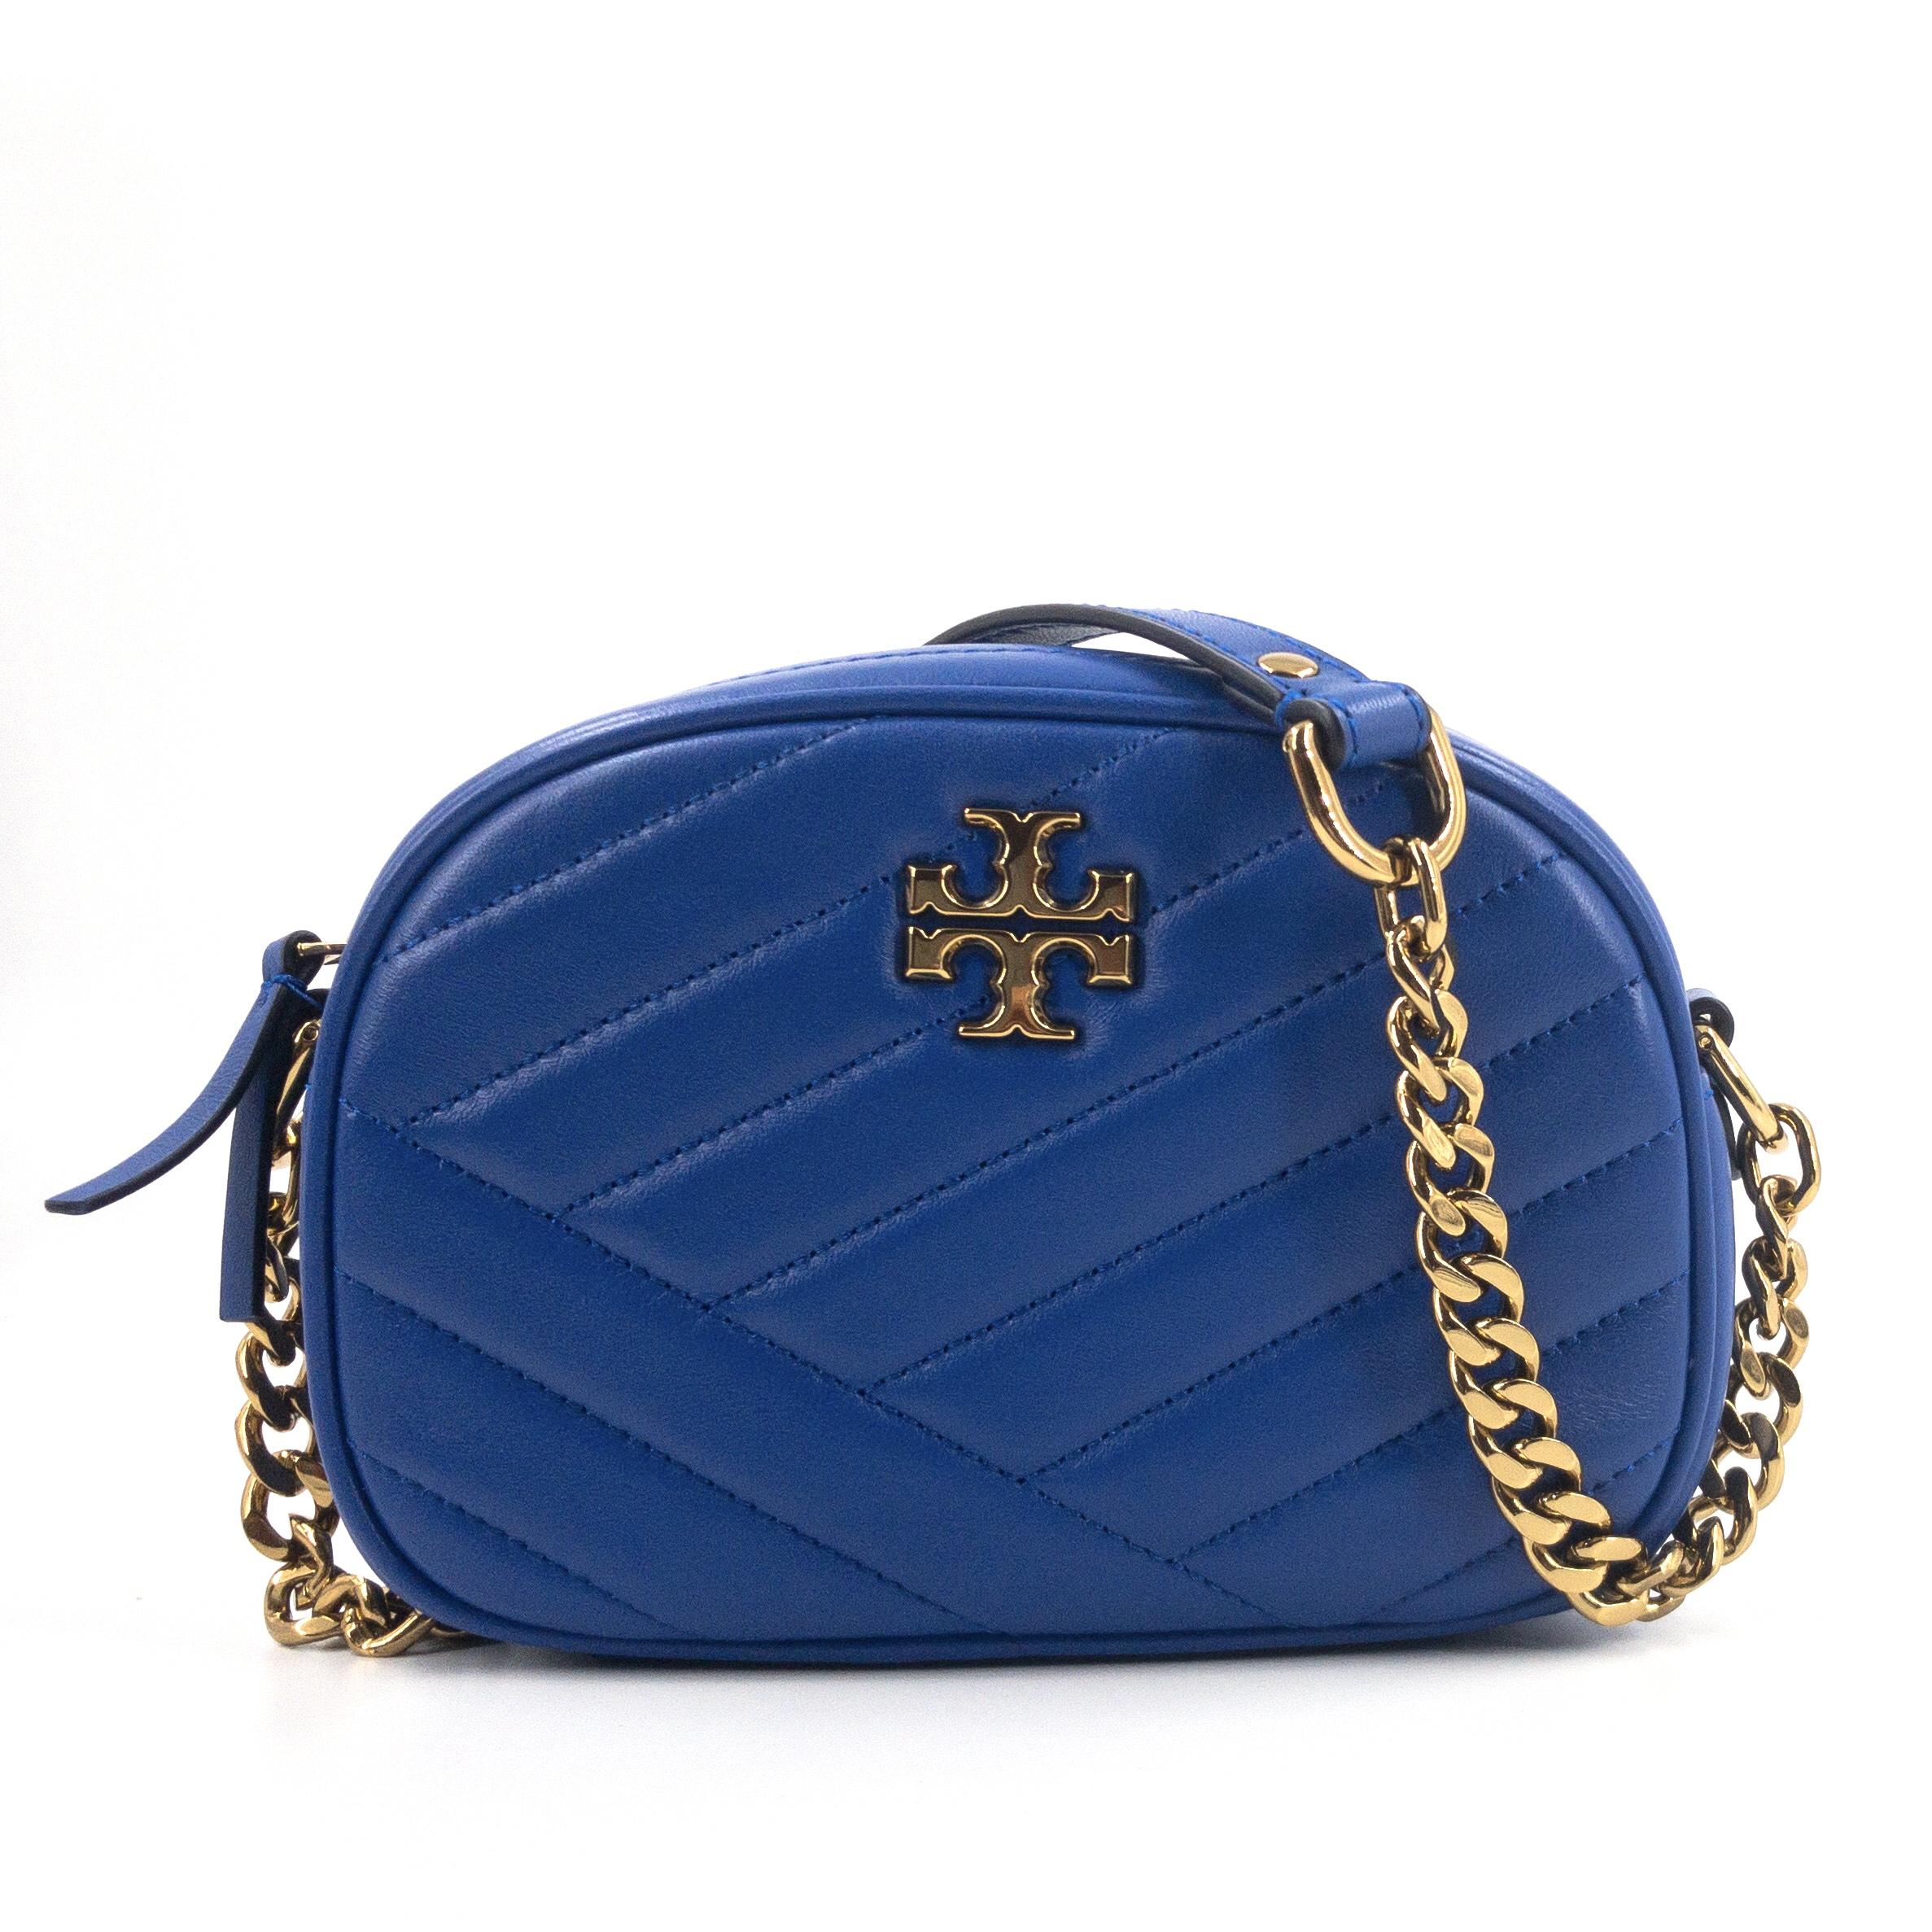 Tory Burch Nautical Blue Kira Chevron Small Camera Bag (02)